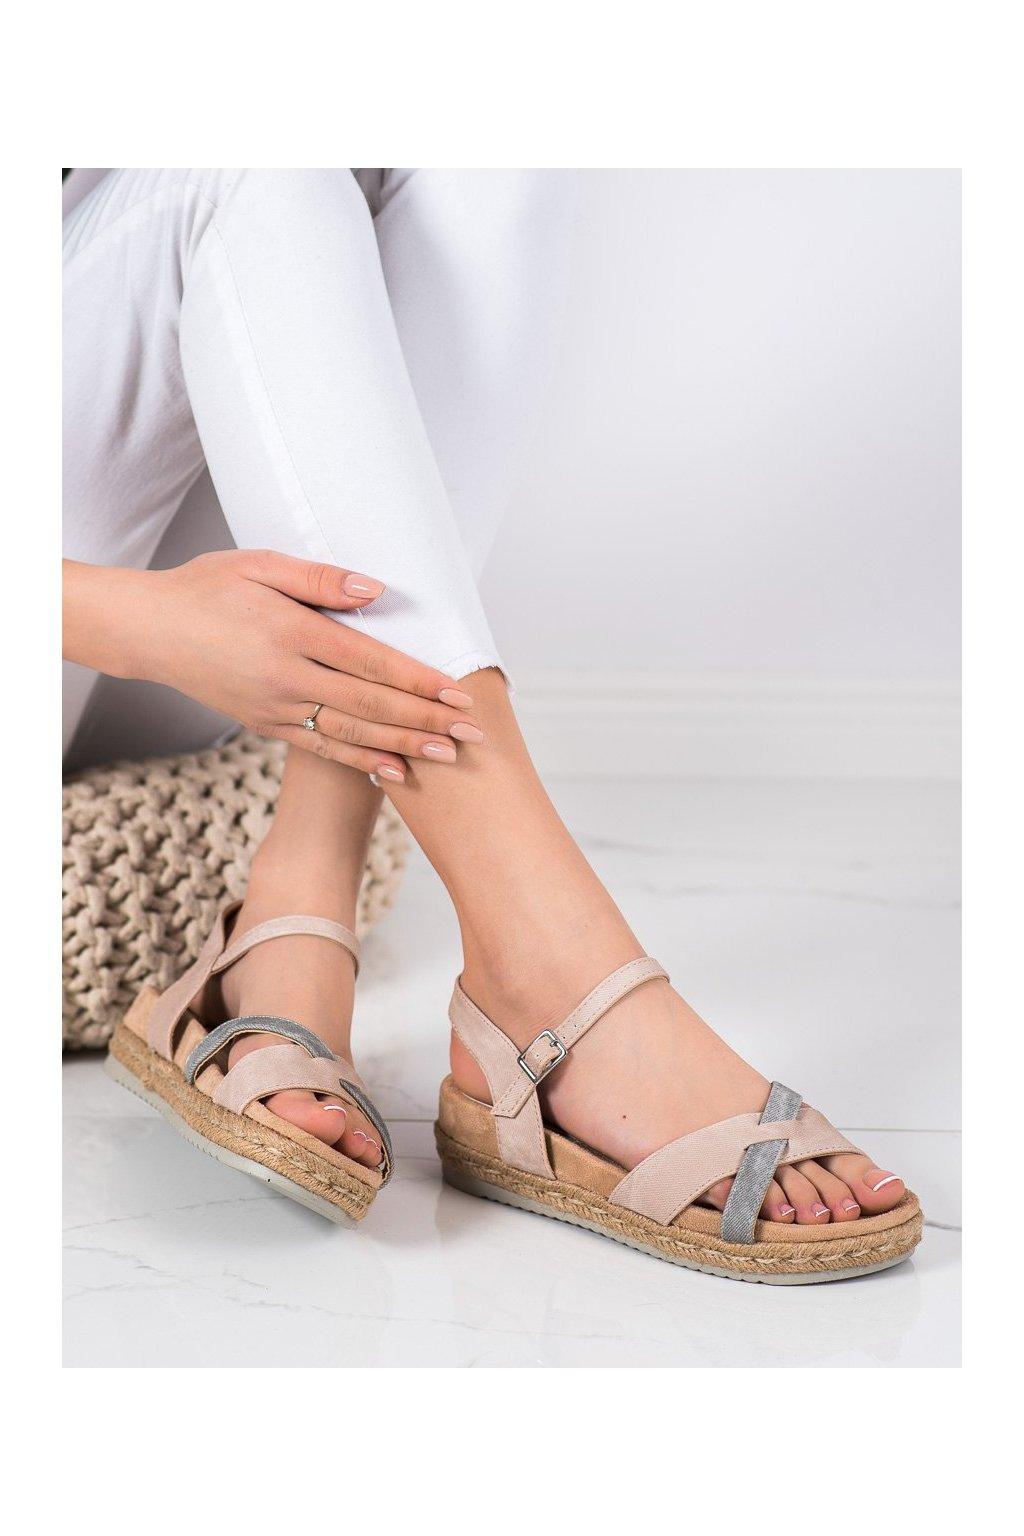 Ružové sandále Kylie kod K1902607NU